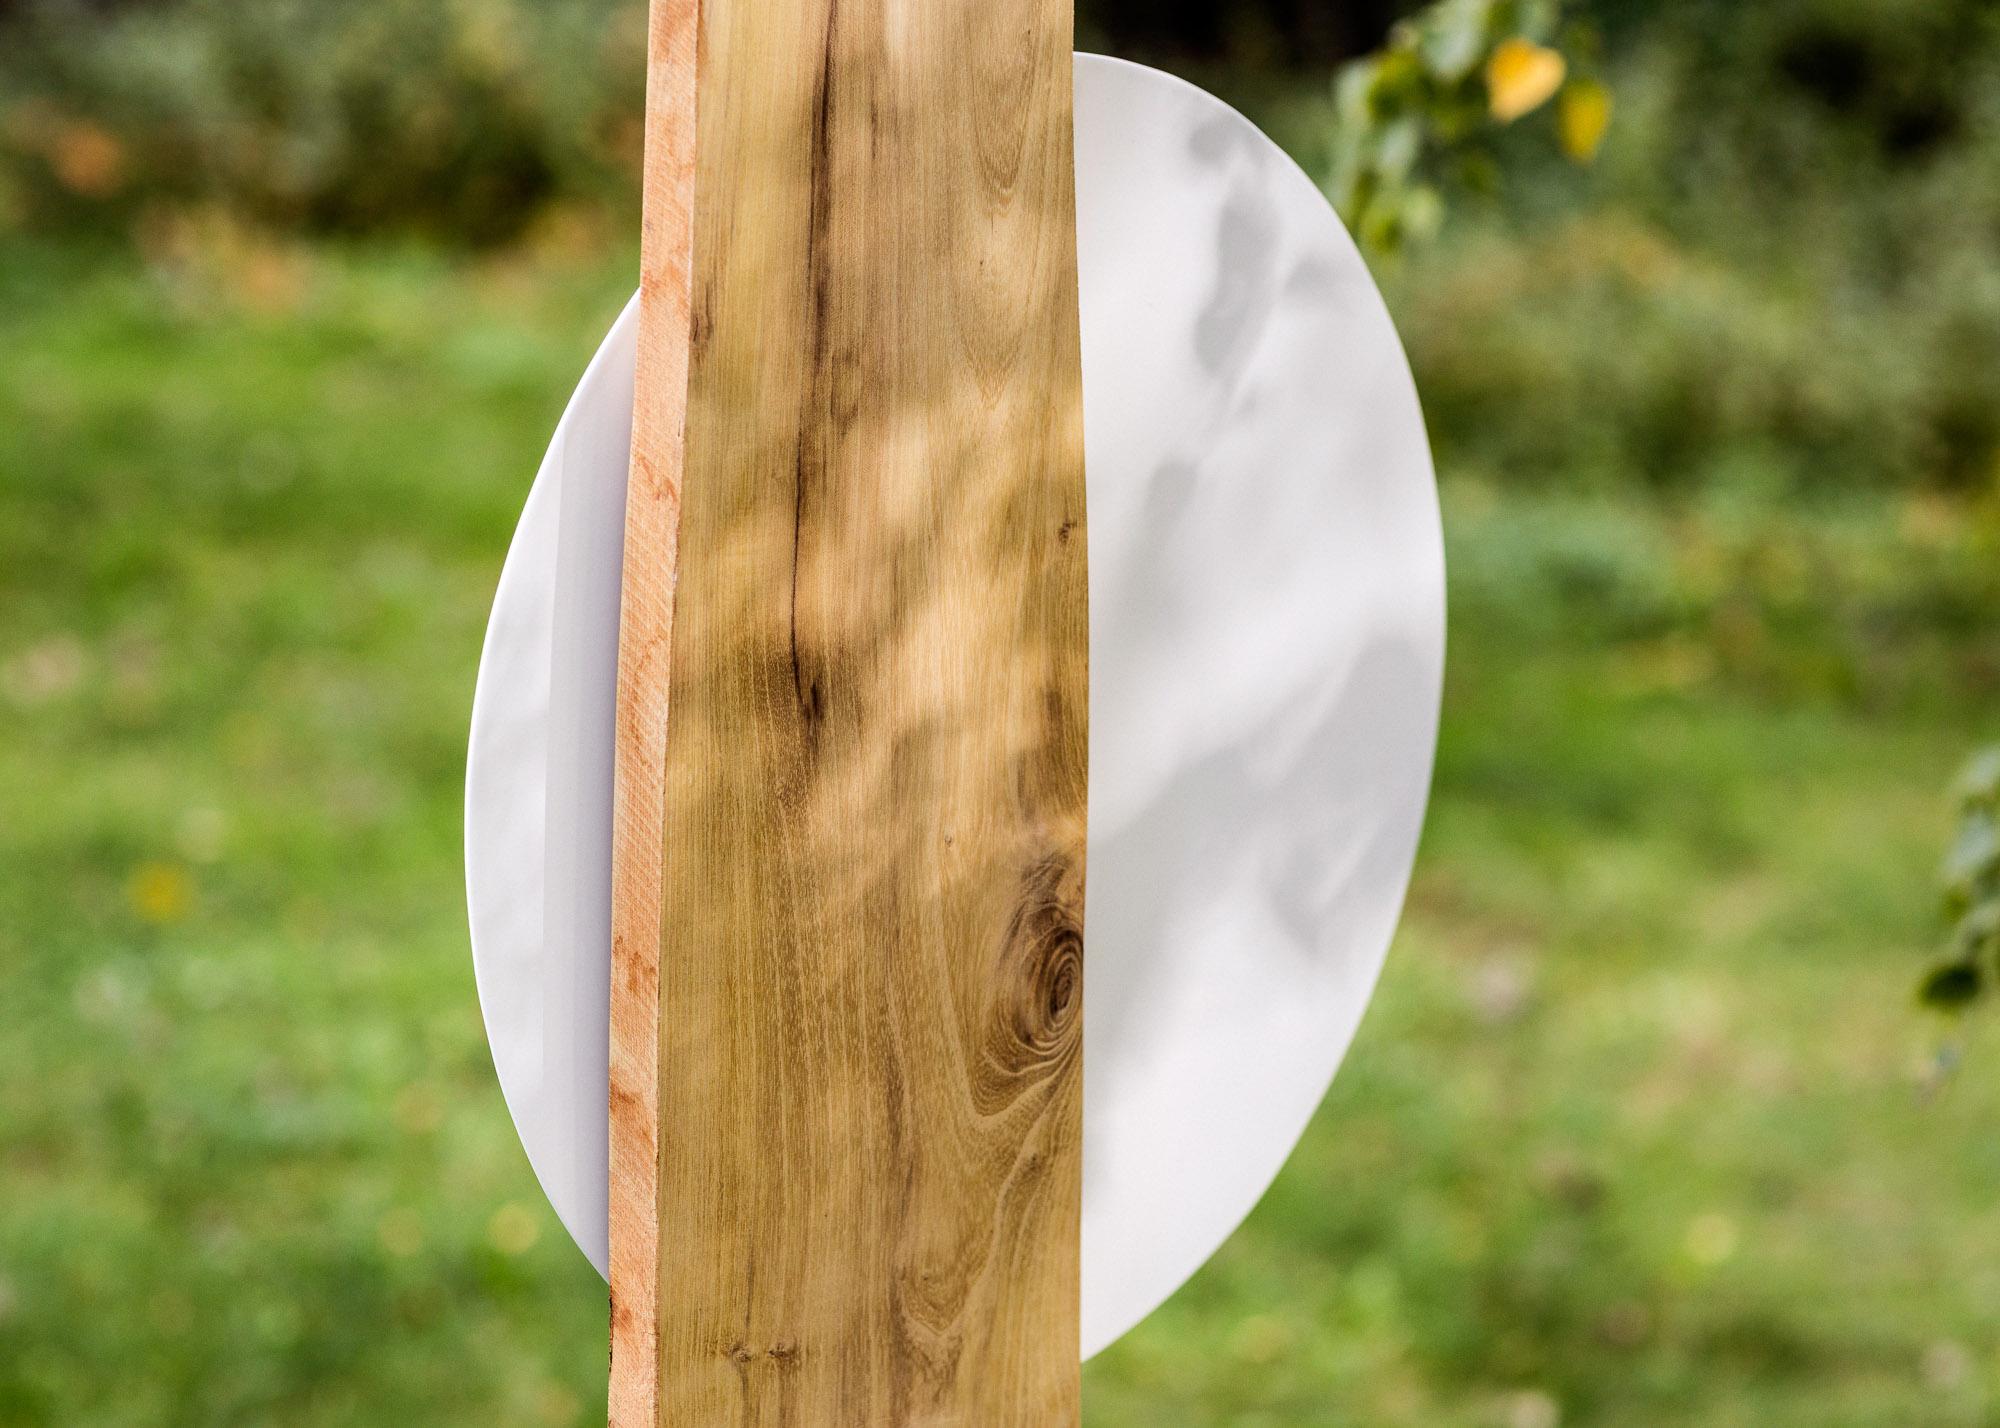 Grabmal in Naturholzlamelle mit rundem Emailleschild